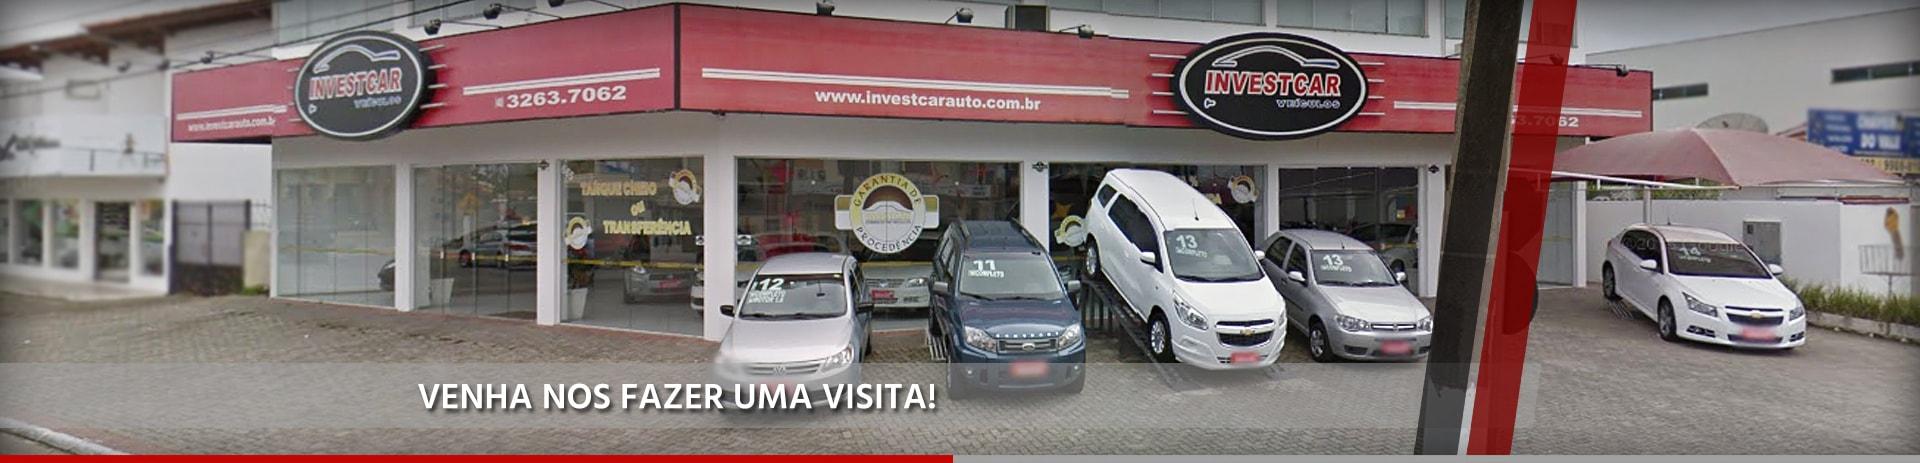 Foto de capa da INVESTCAR. Loja de carros em Tijucas/SC.